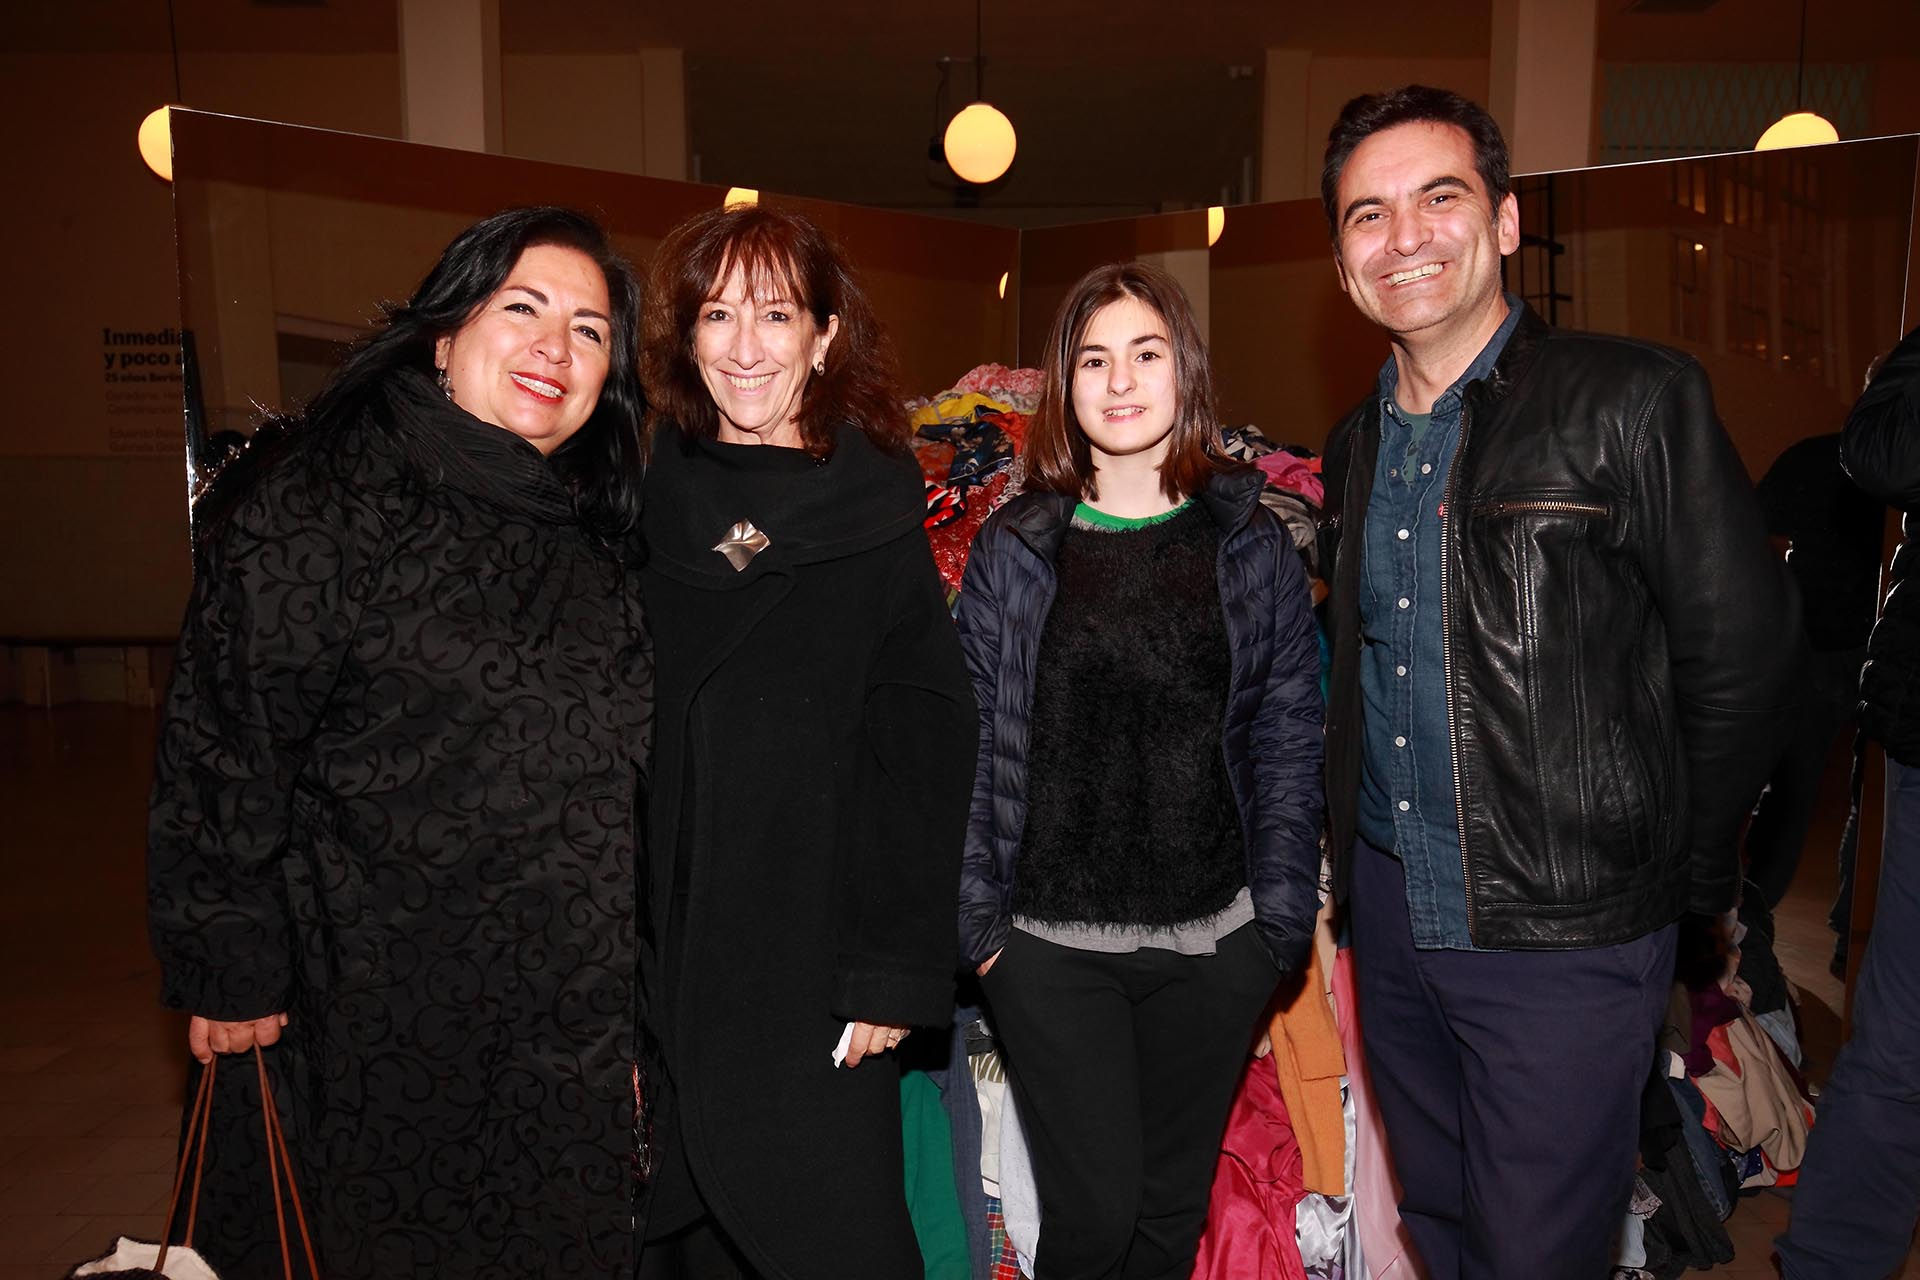 Betsabé Romero, Liliana Piñeiro, Daniel Abate y su hija